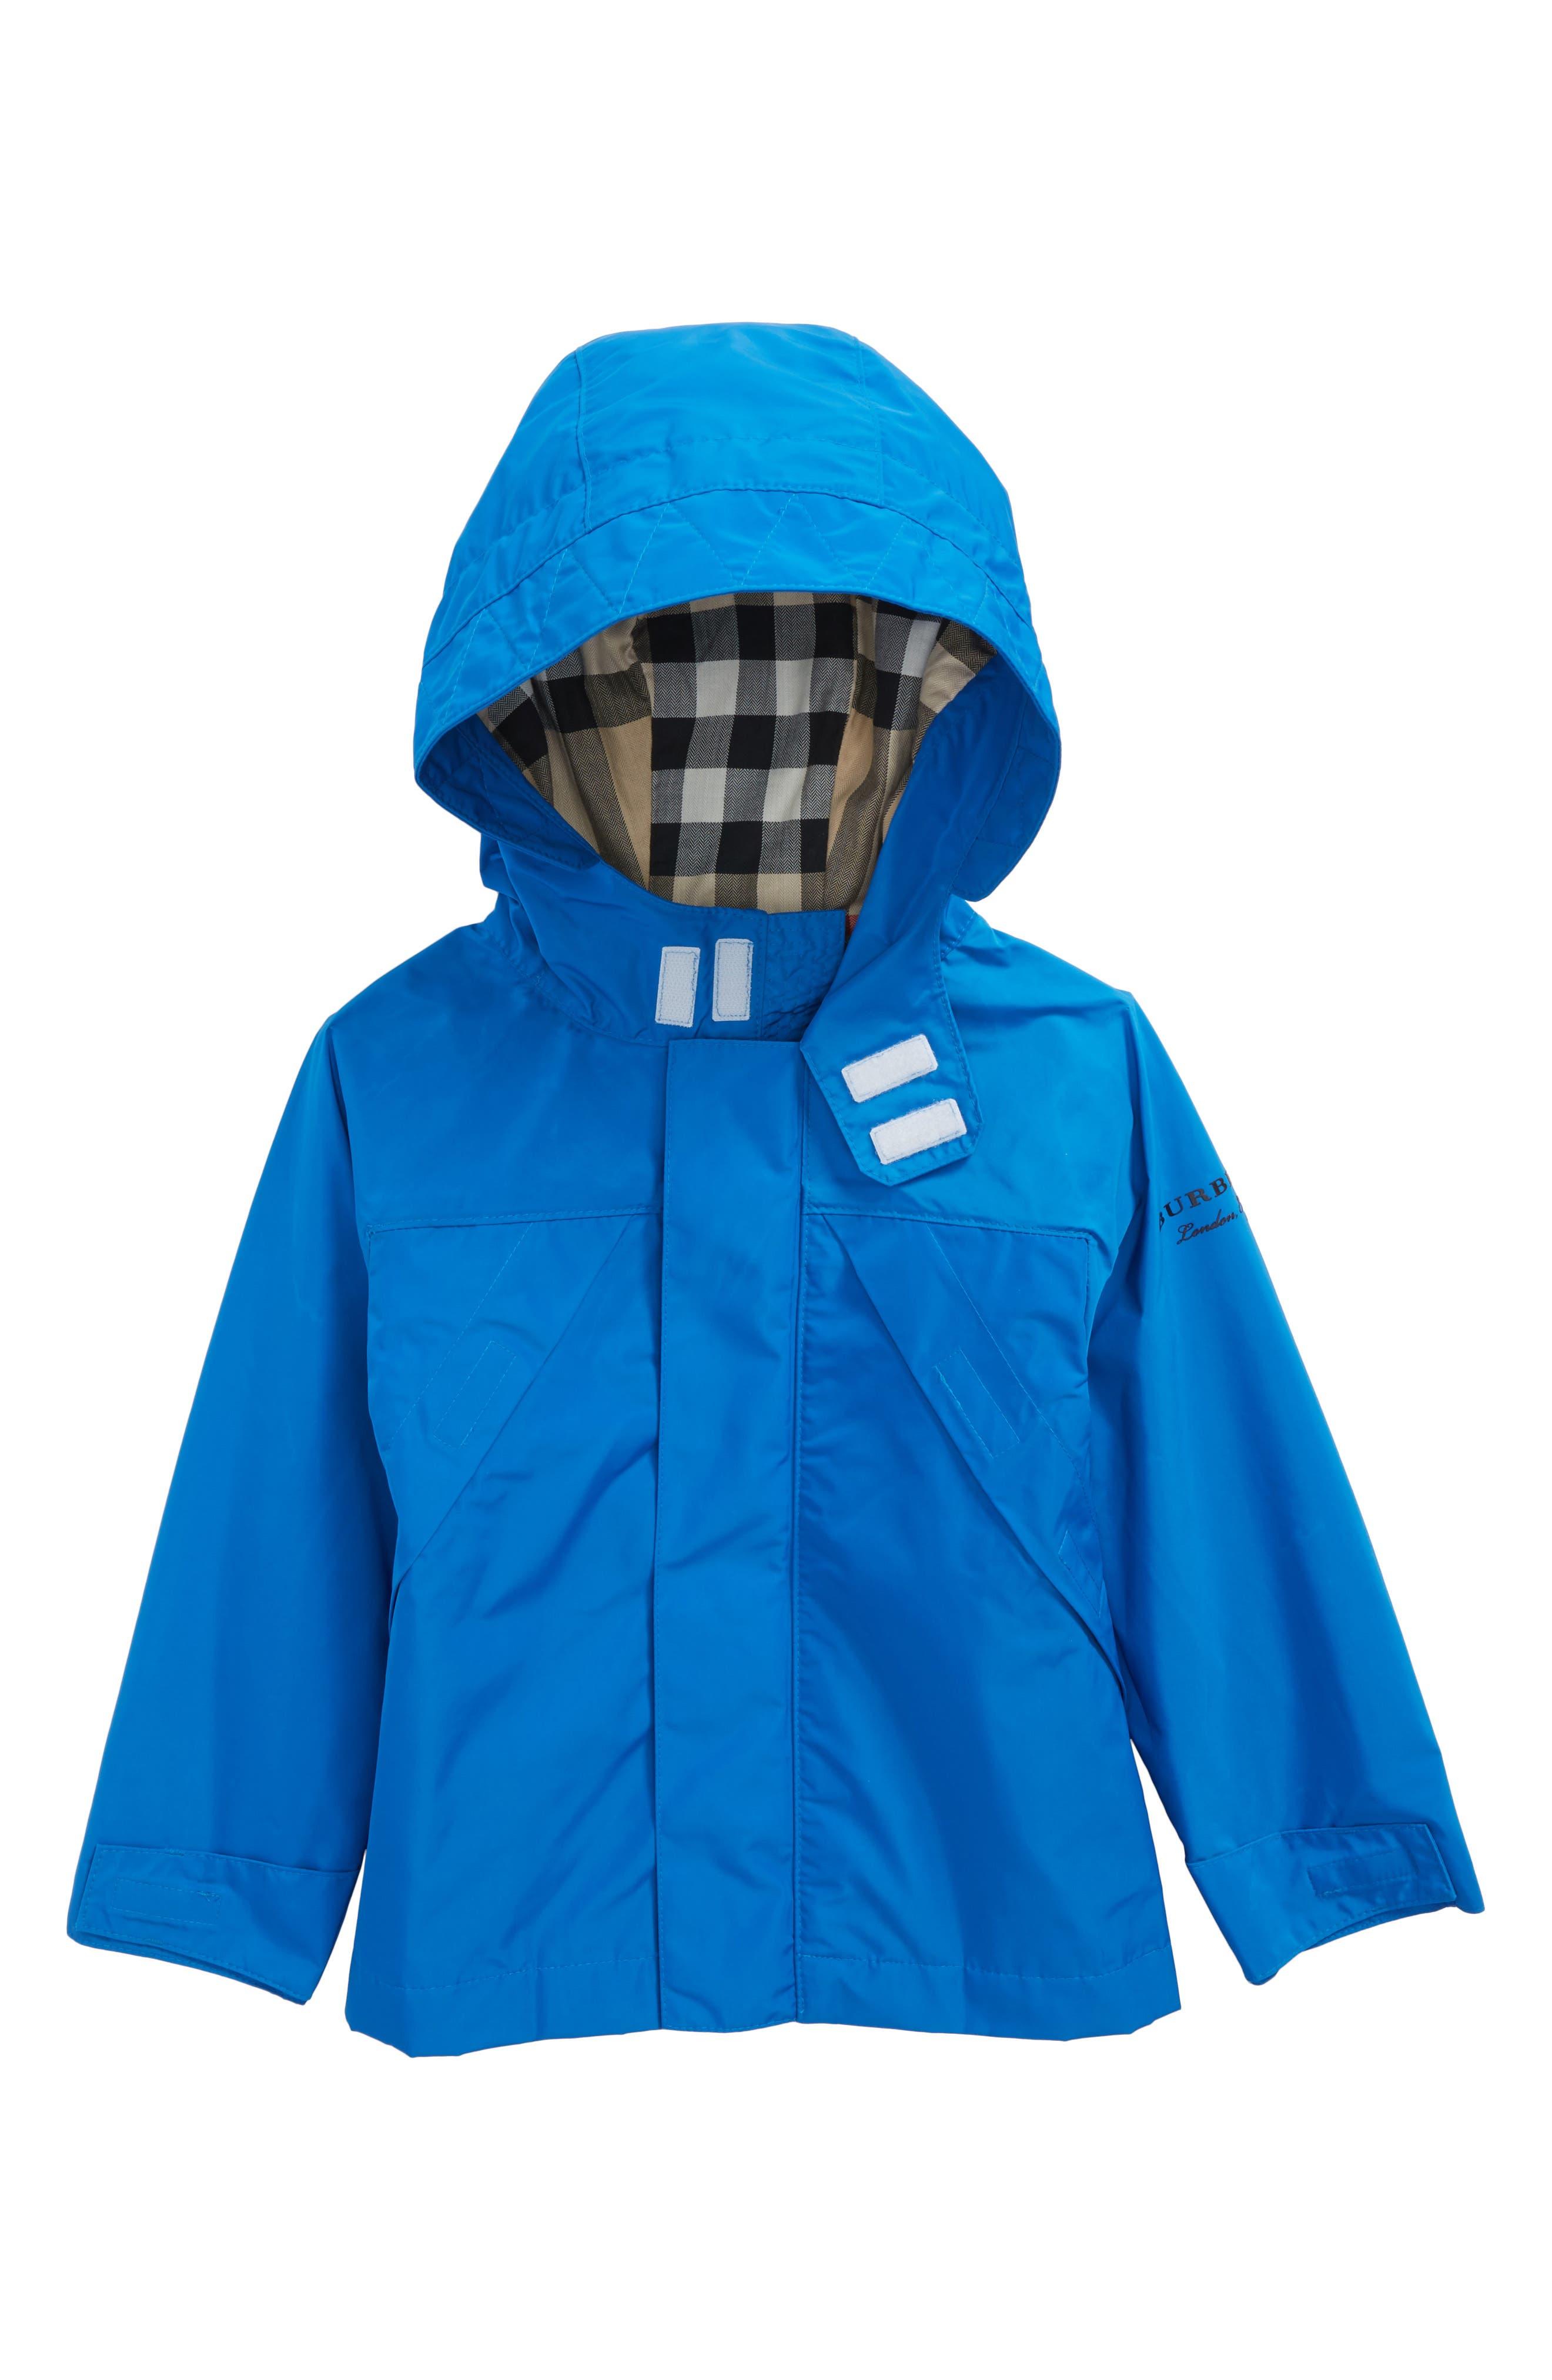 Yeoman Hooded Taffeta Windbreaker Jacket,                             Main thumbnail 1, color,                             420